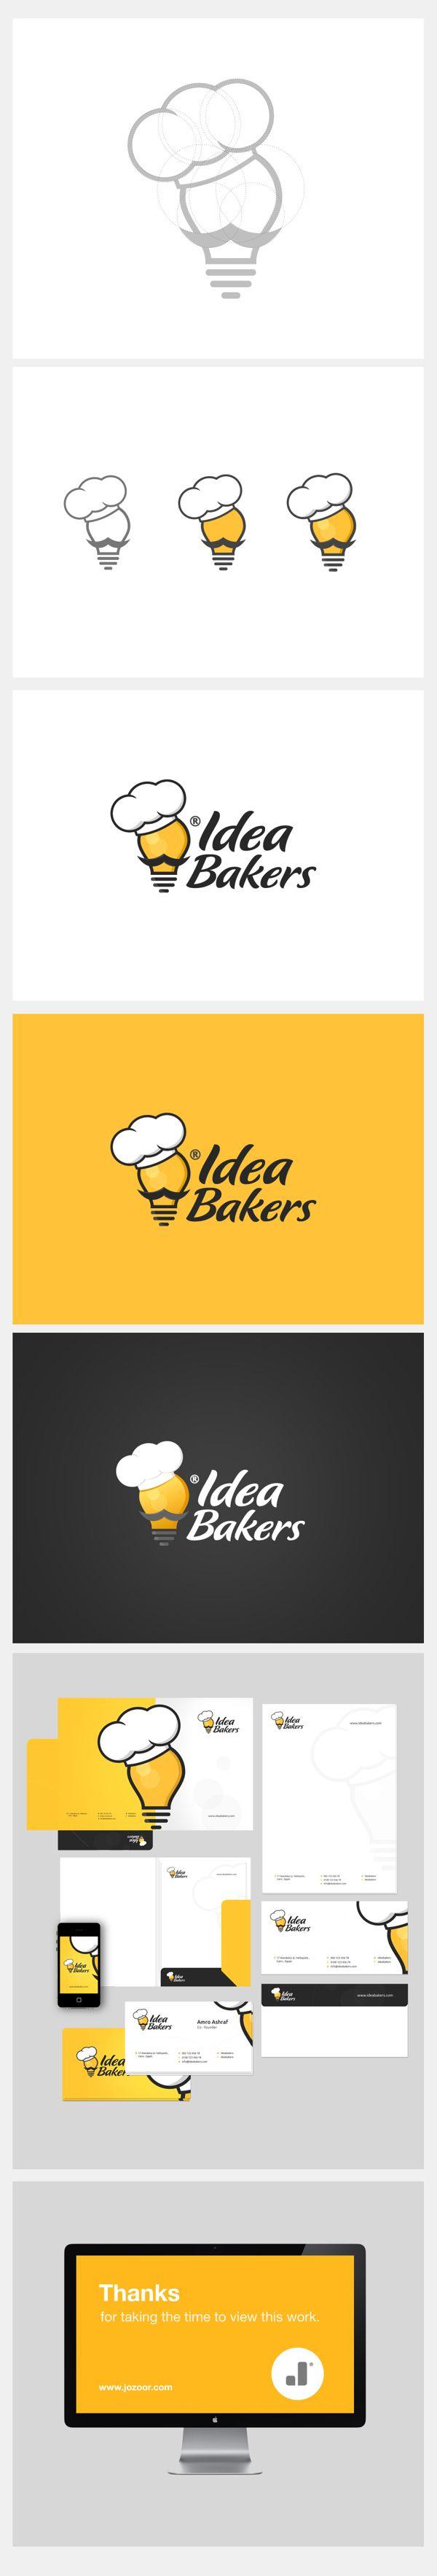 Idea Bakers brand by Jozoor , via Behance